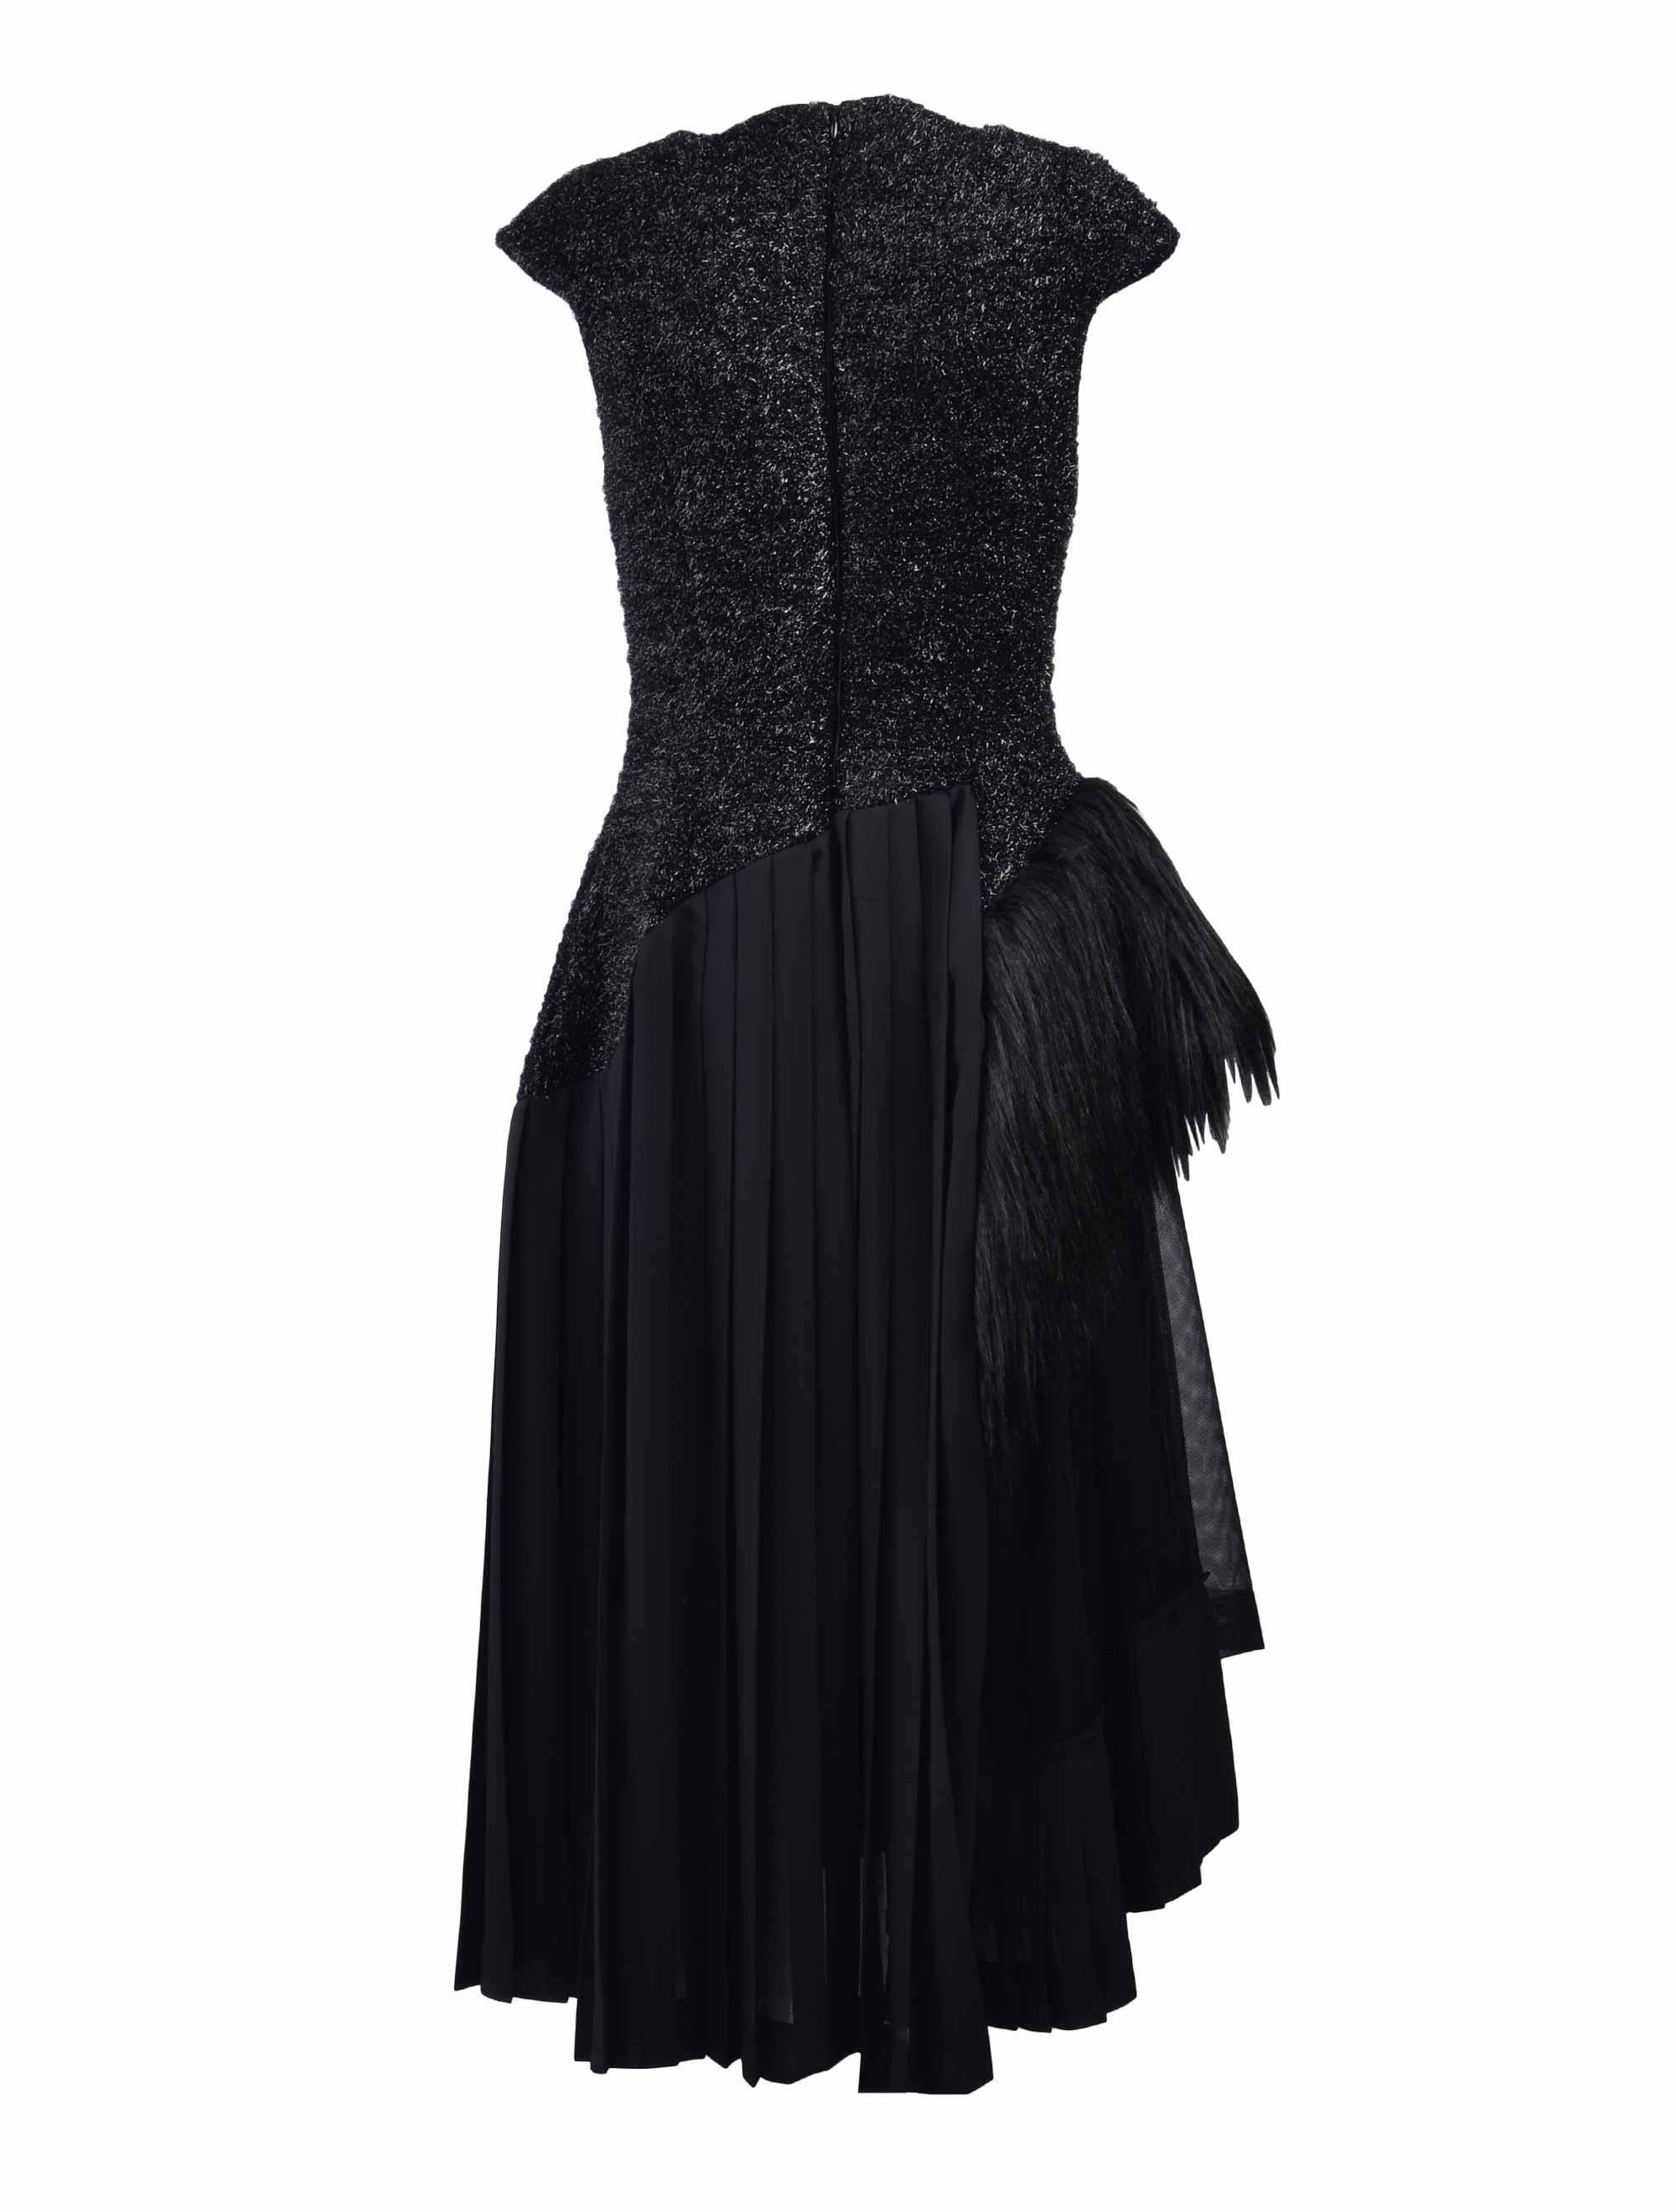 Picture of Simone Rocha   Asymmetric Dress